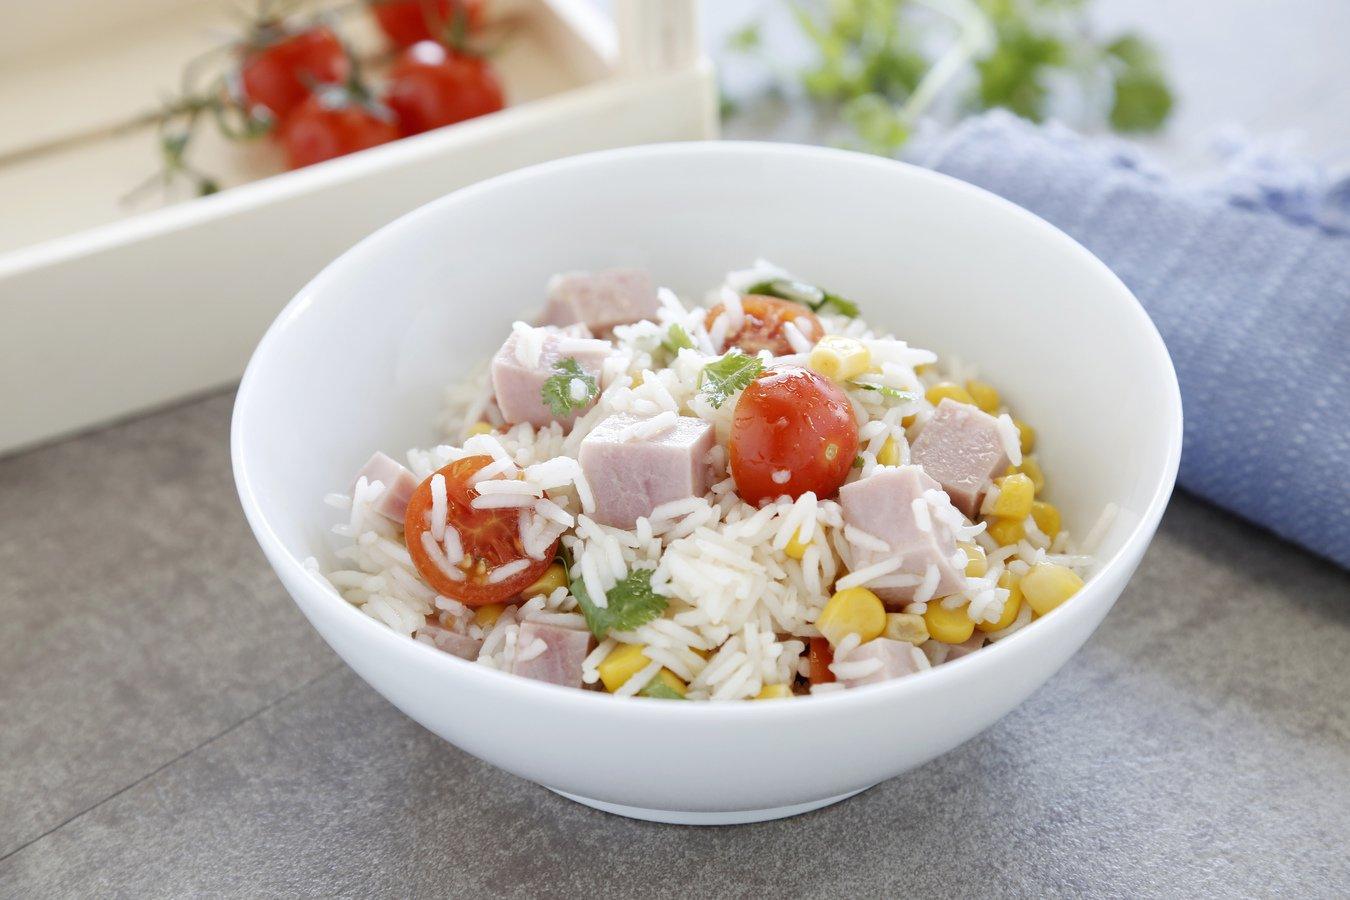 Arroz Basmati con maíz, tomate cherry y jamón cocido